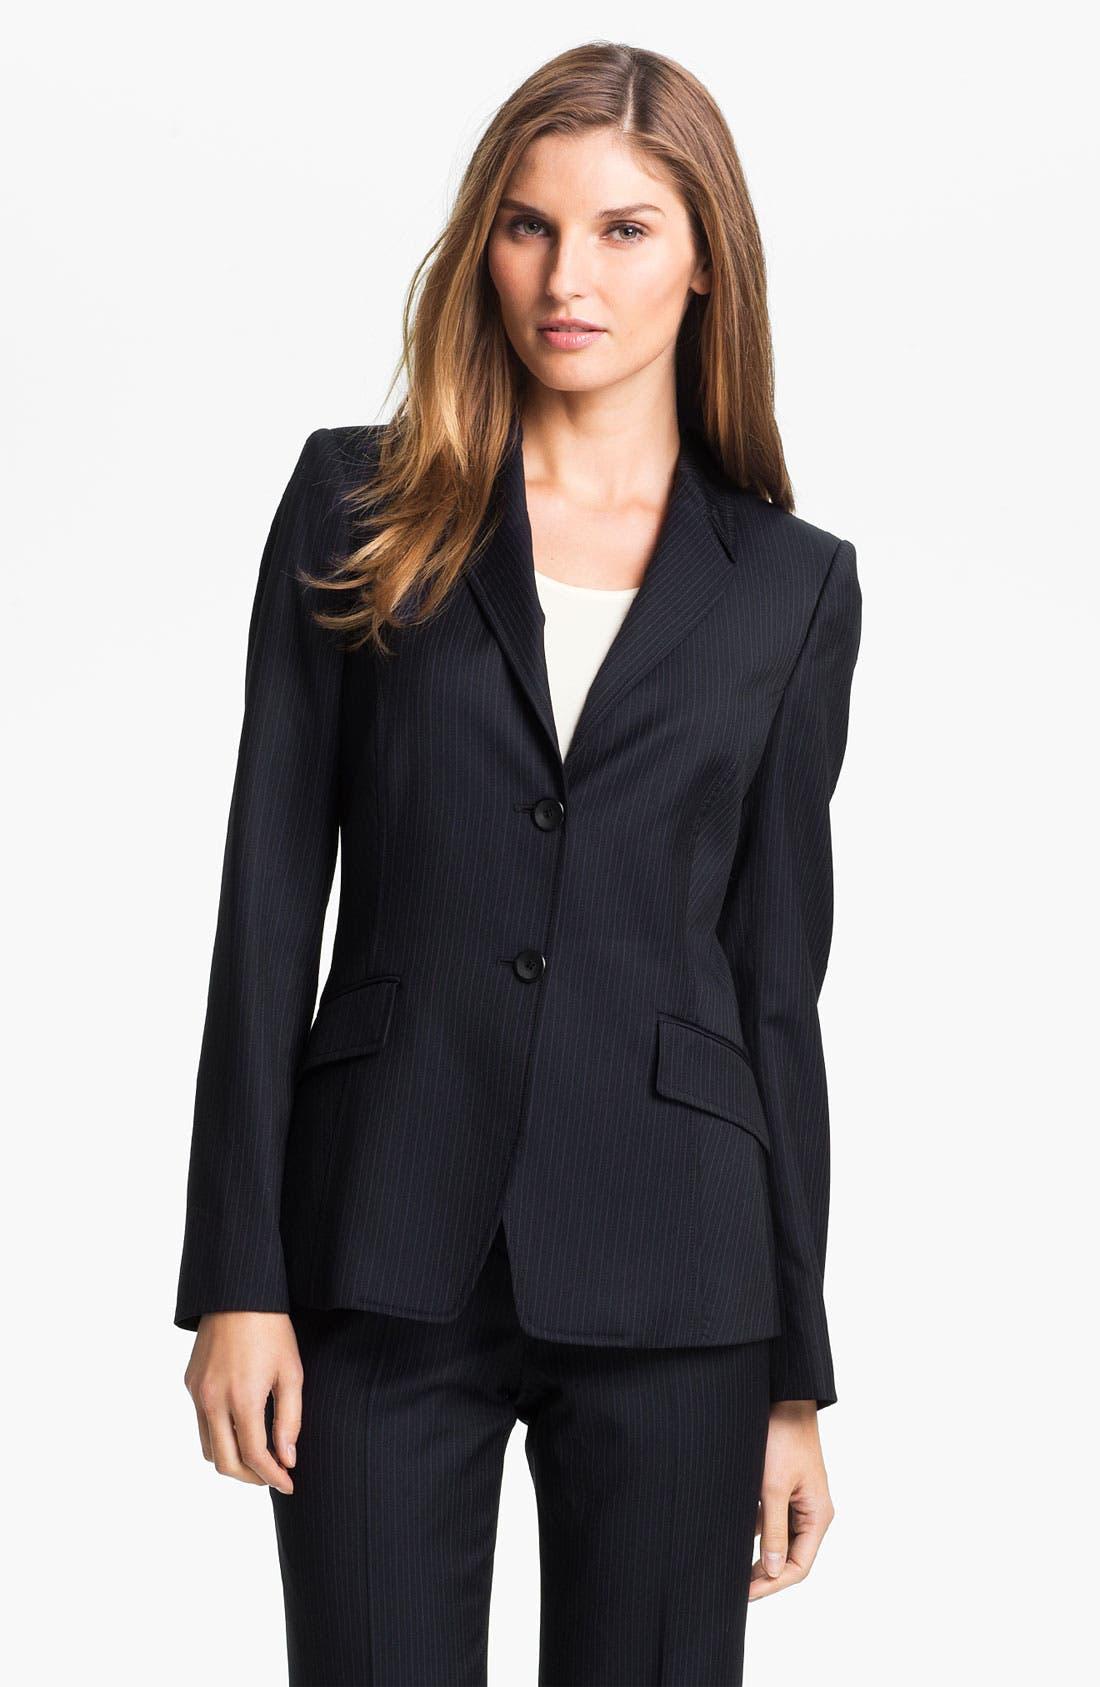 Main Image - Santorelli 'Vicky' Shaped Jacket